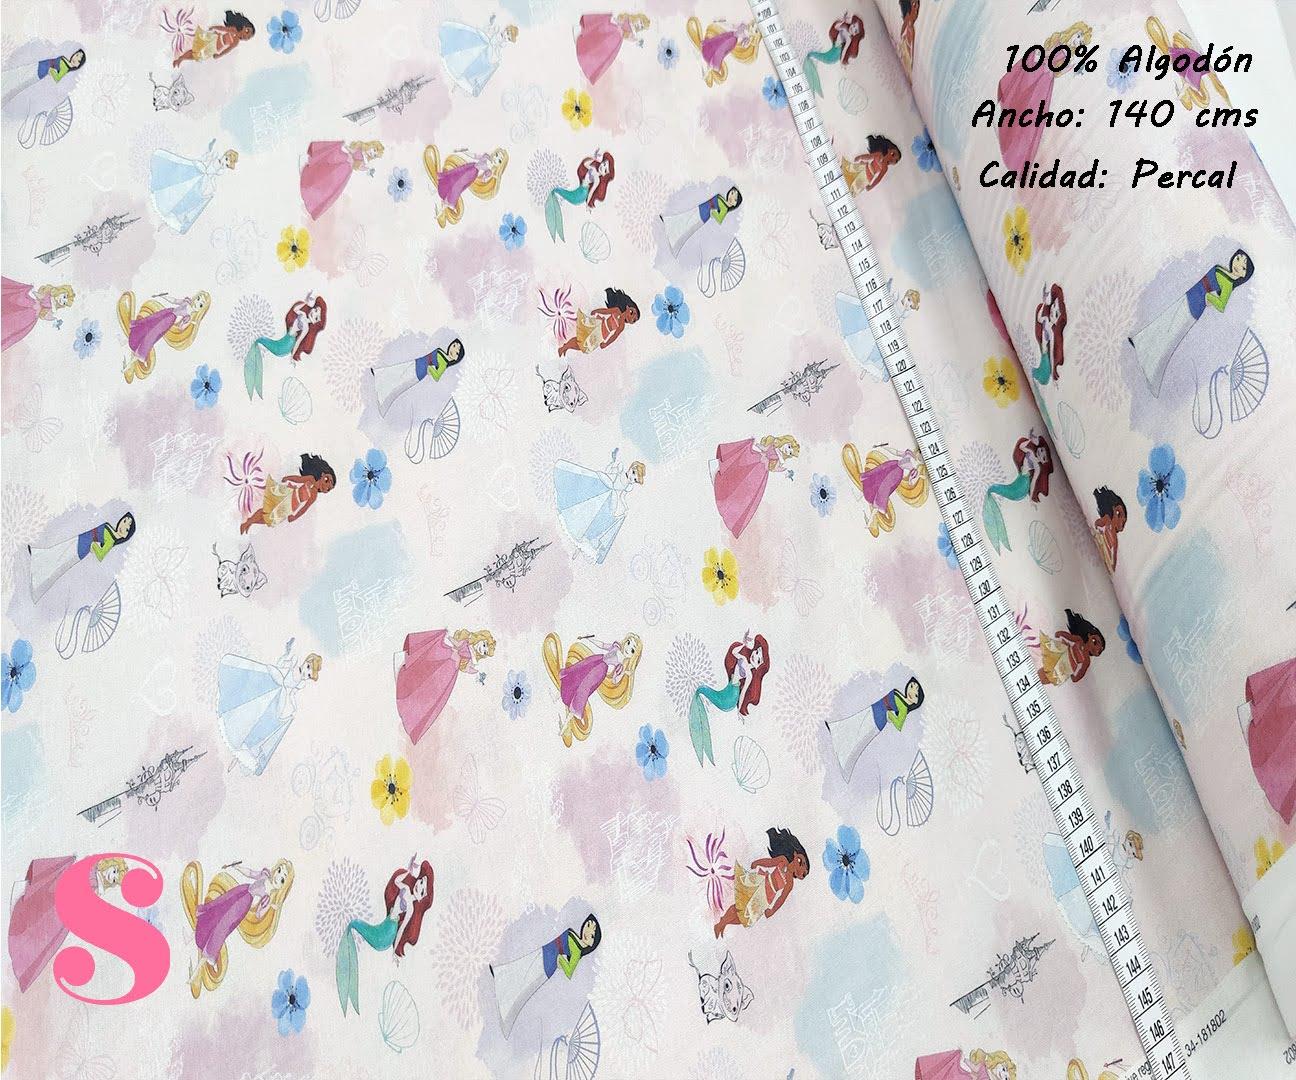 591-princesas-disney-fondo-rosa-tejidos-algodon-estampado-percal,Tejido Infantil Estampado Princesas Disney fondo Rosa